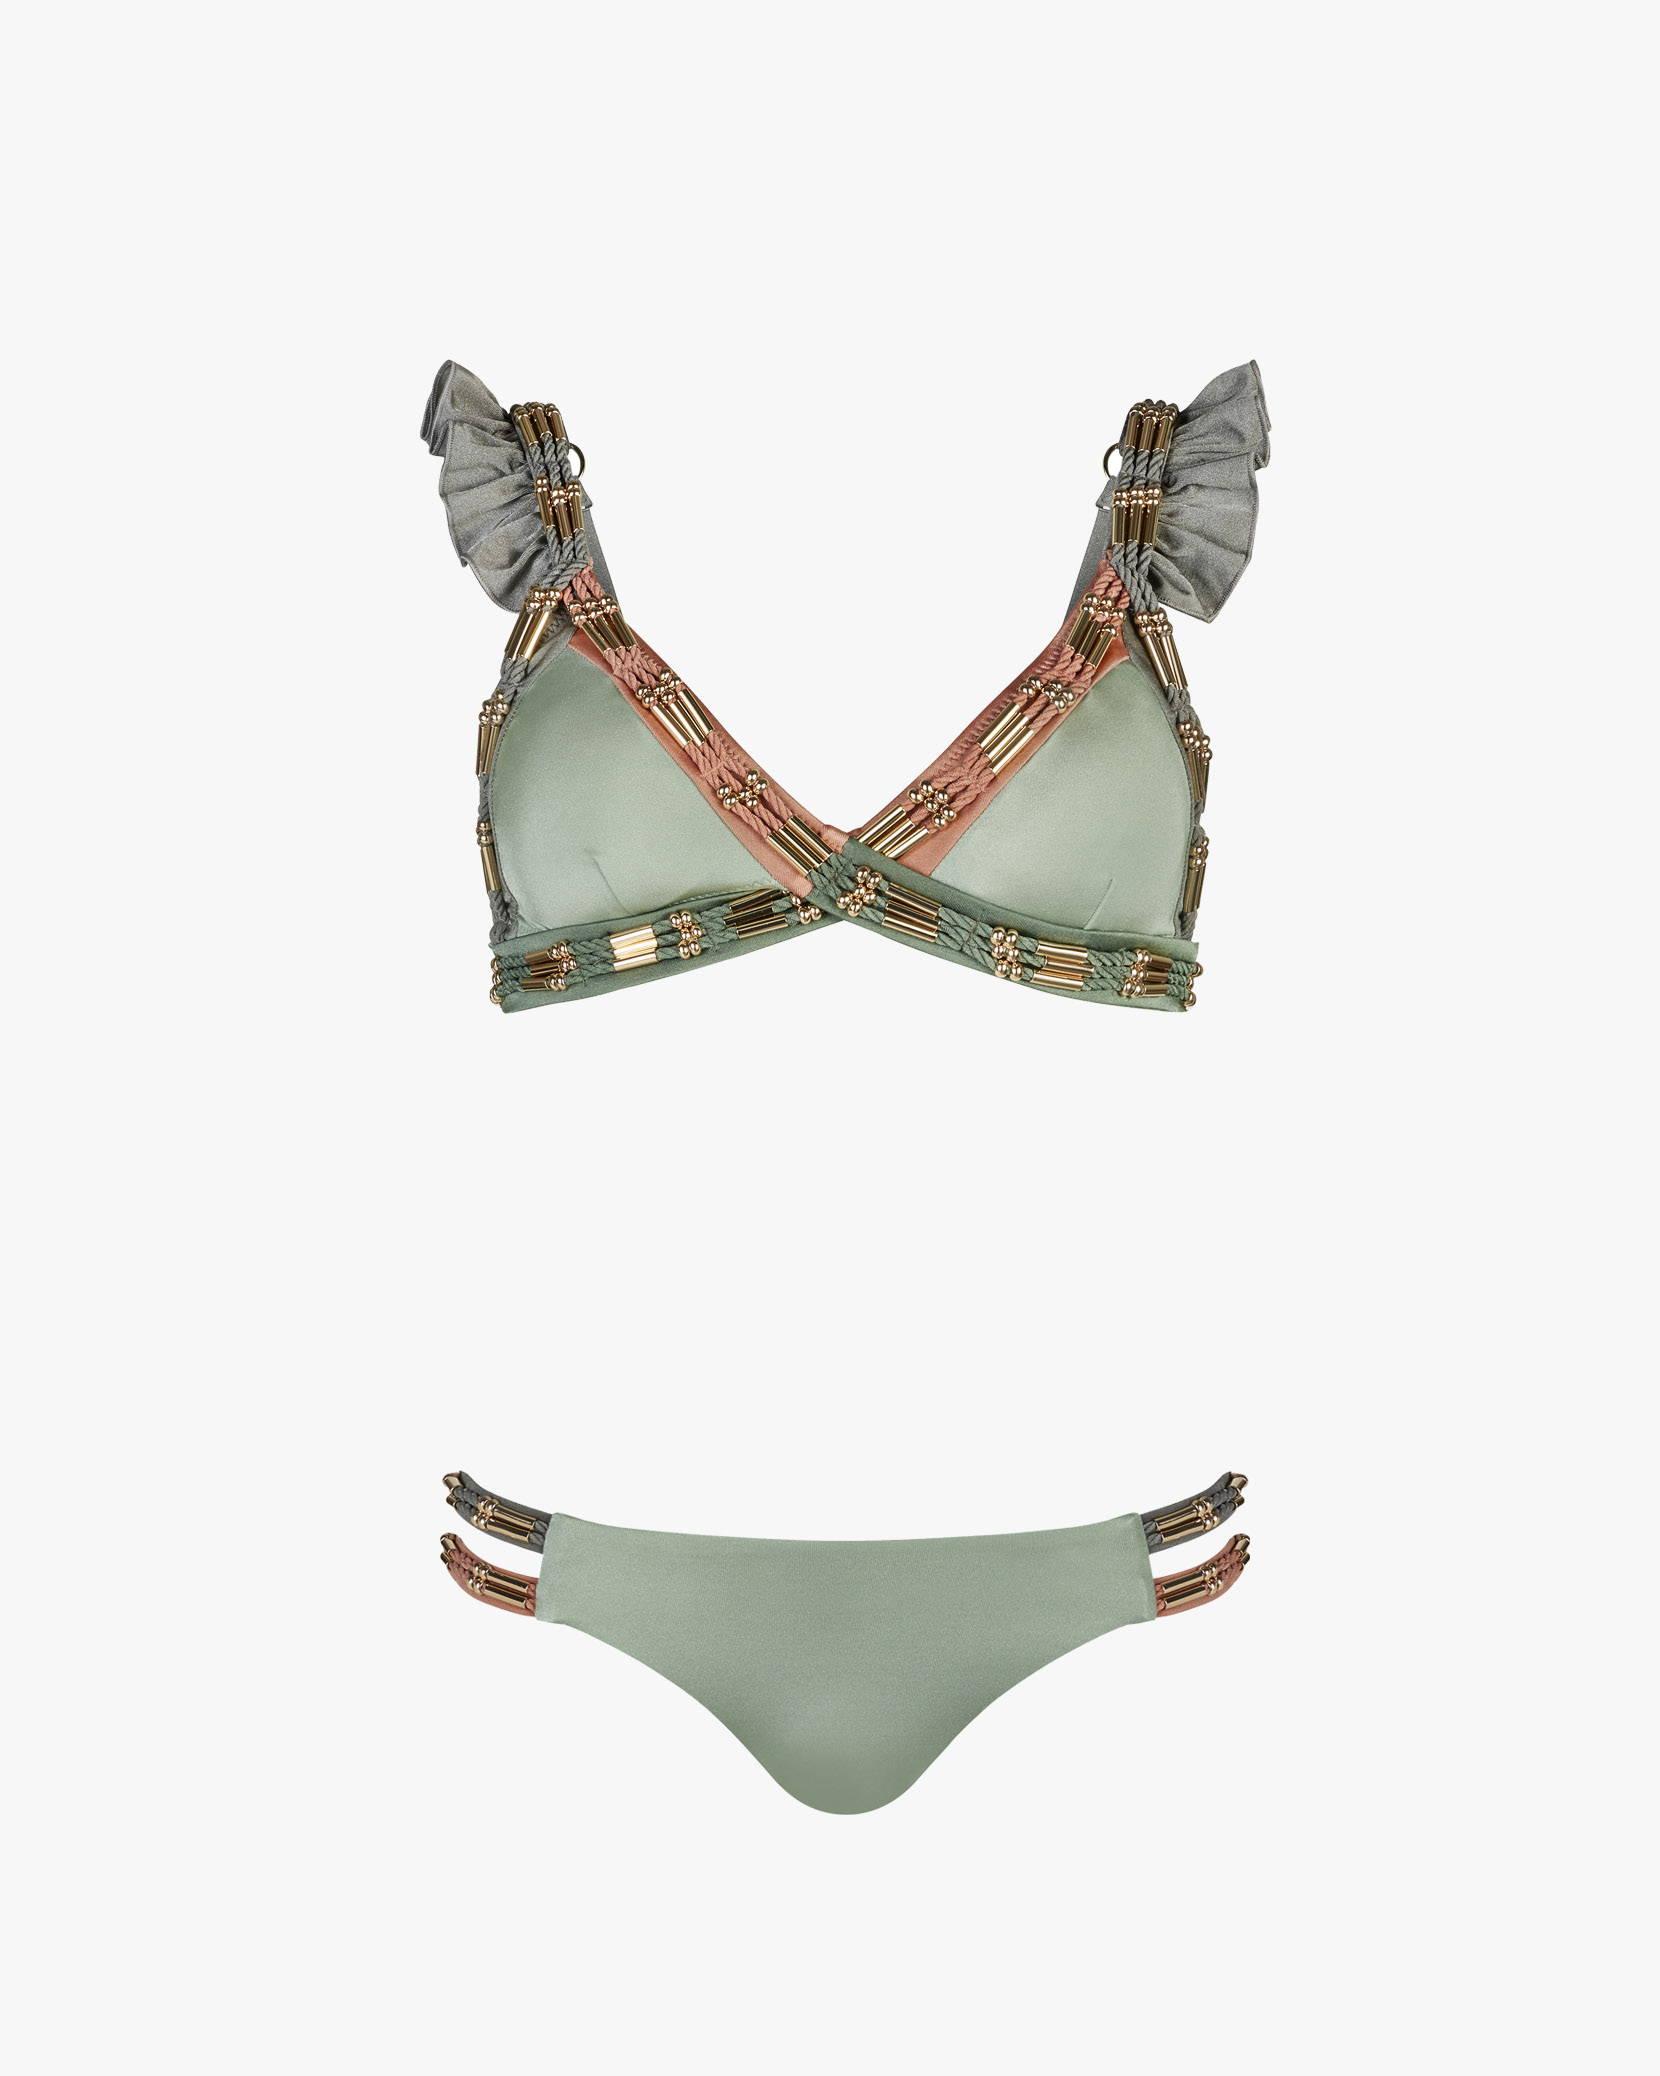 Lily & Rose Swimwear Gatsby Bikini in green